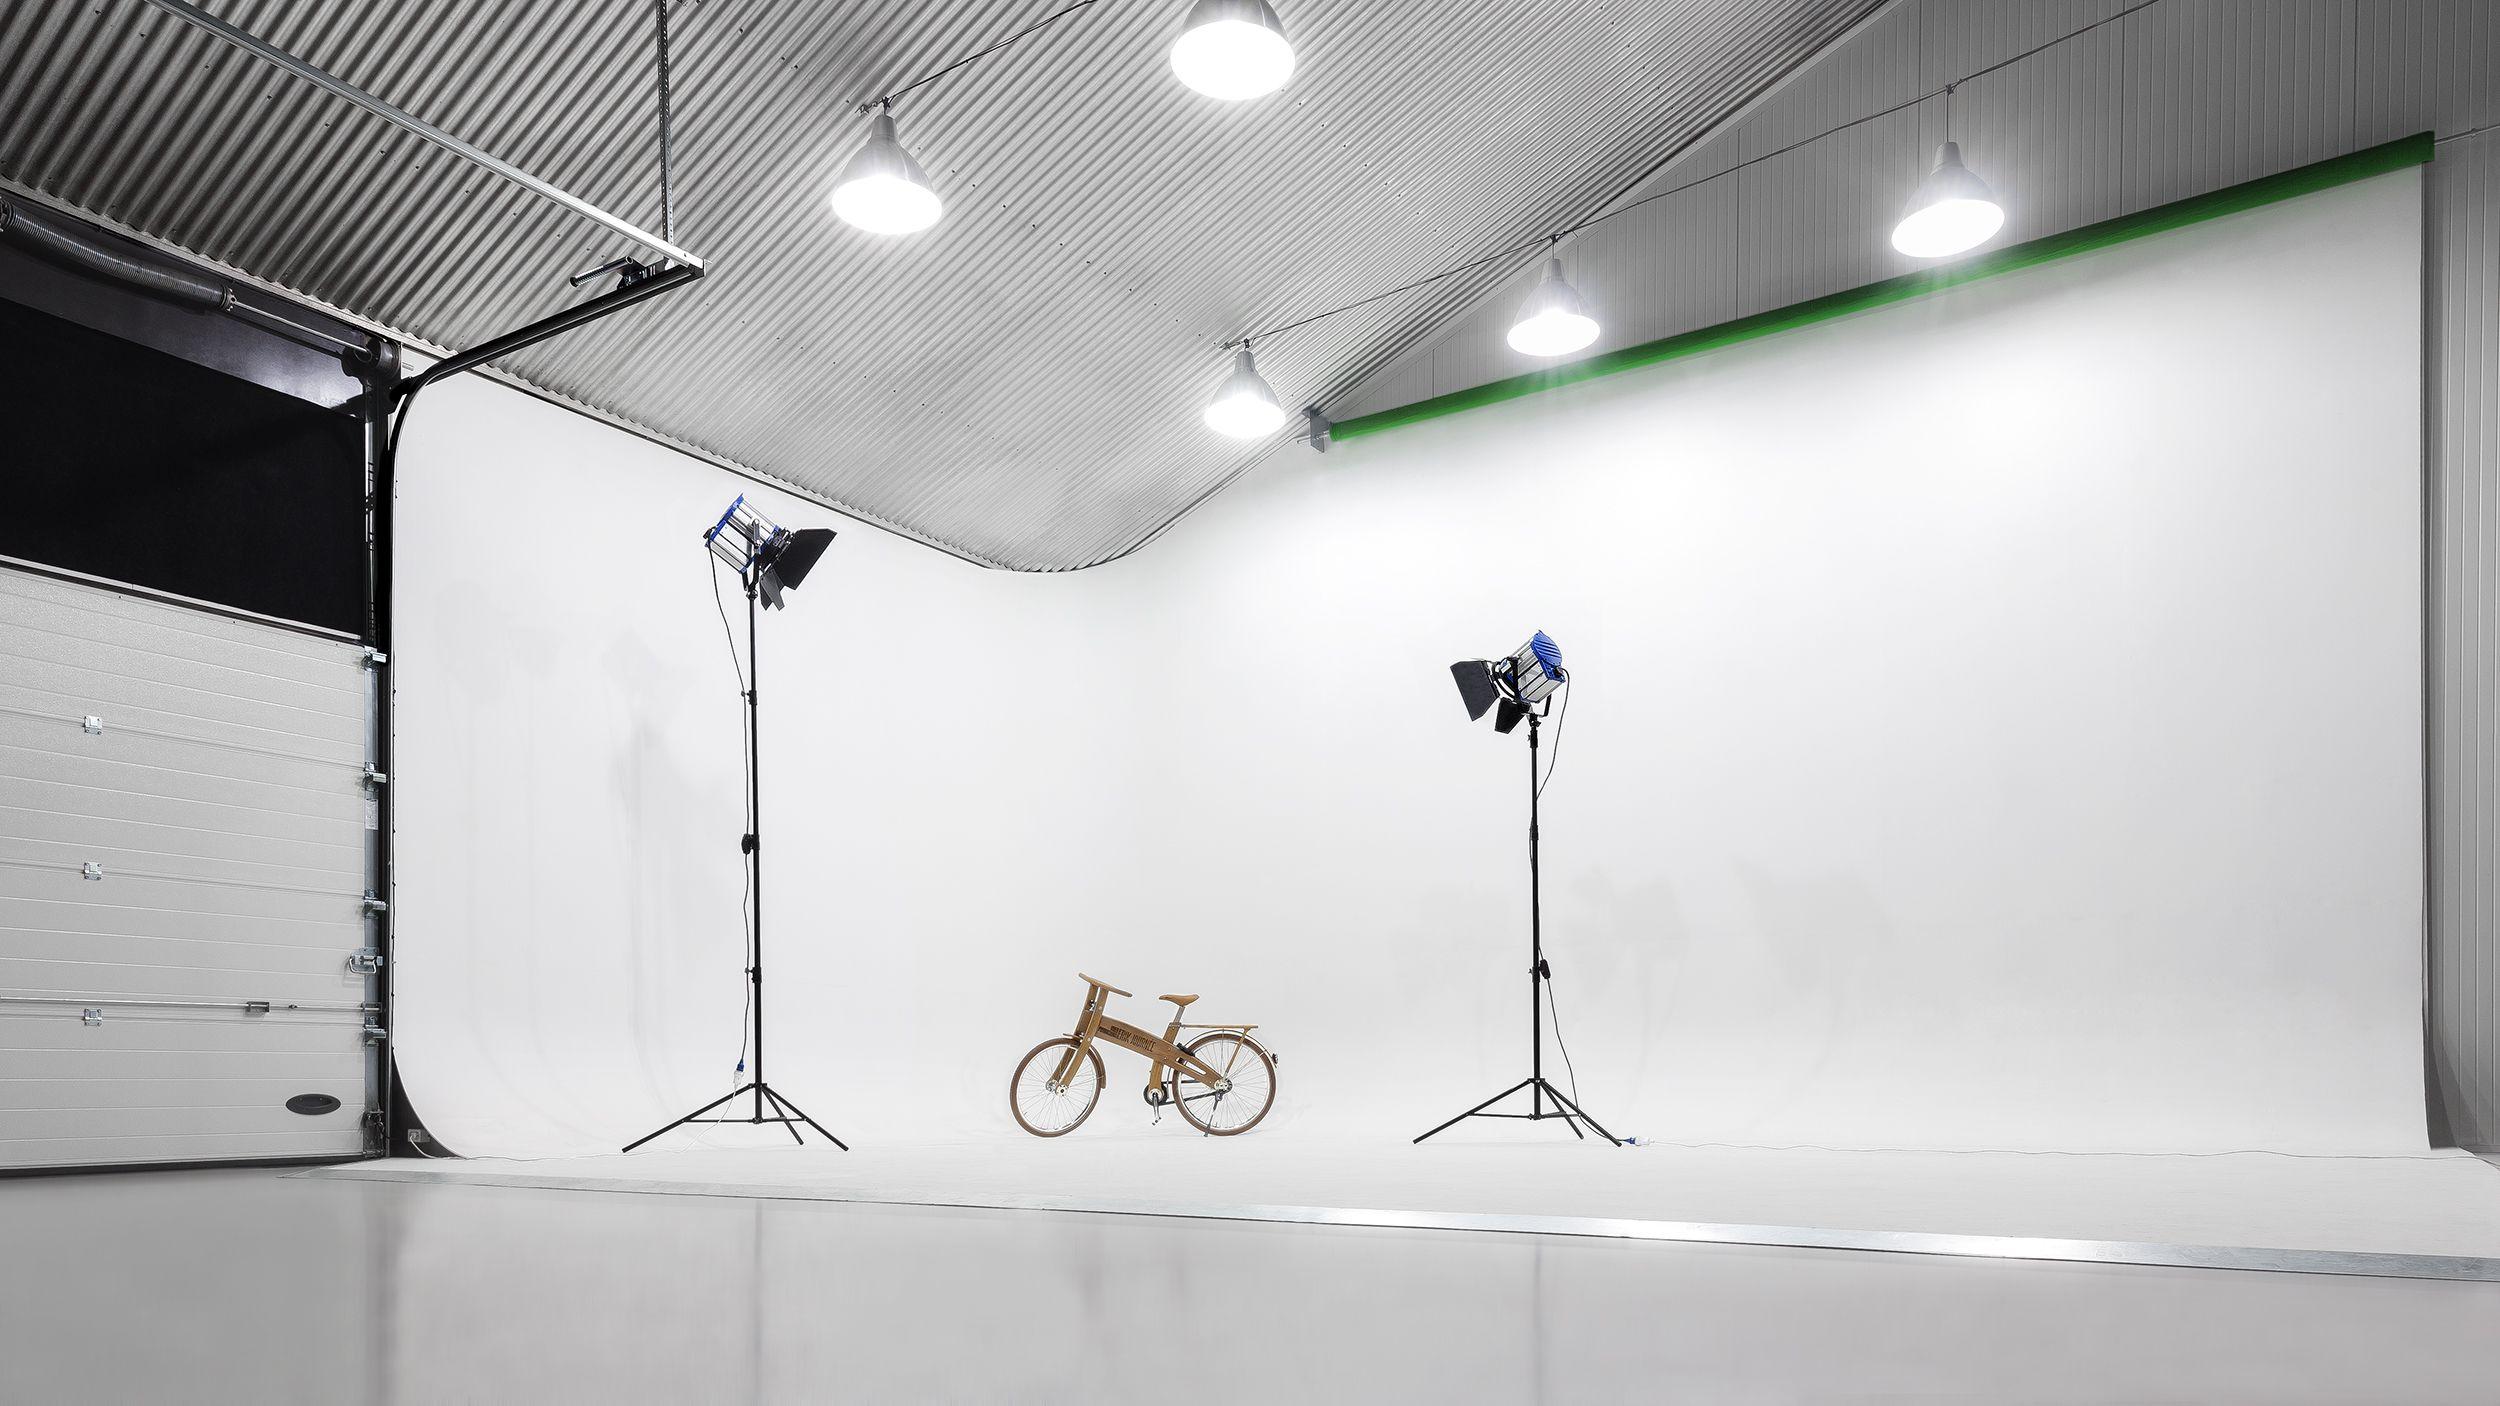 Cyclorama Infinity Wall Studio For Photography Film Www Newdaystudio Nl Studio Build Photography Studio Setup Studio